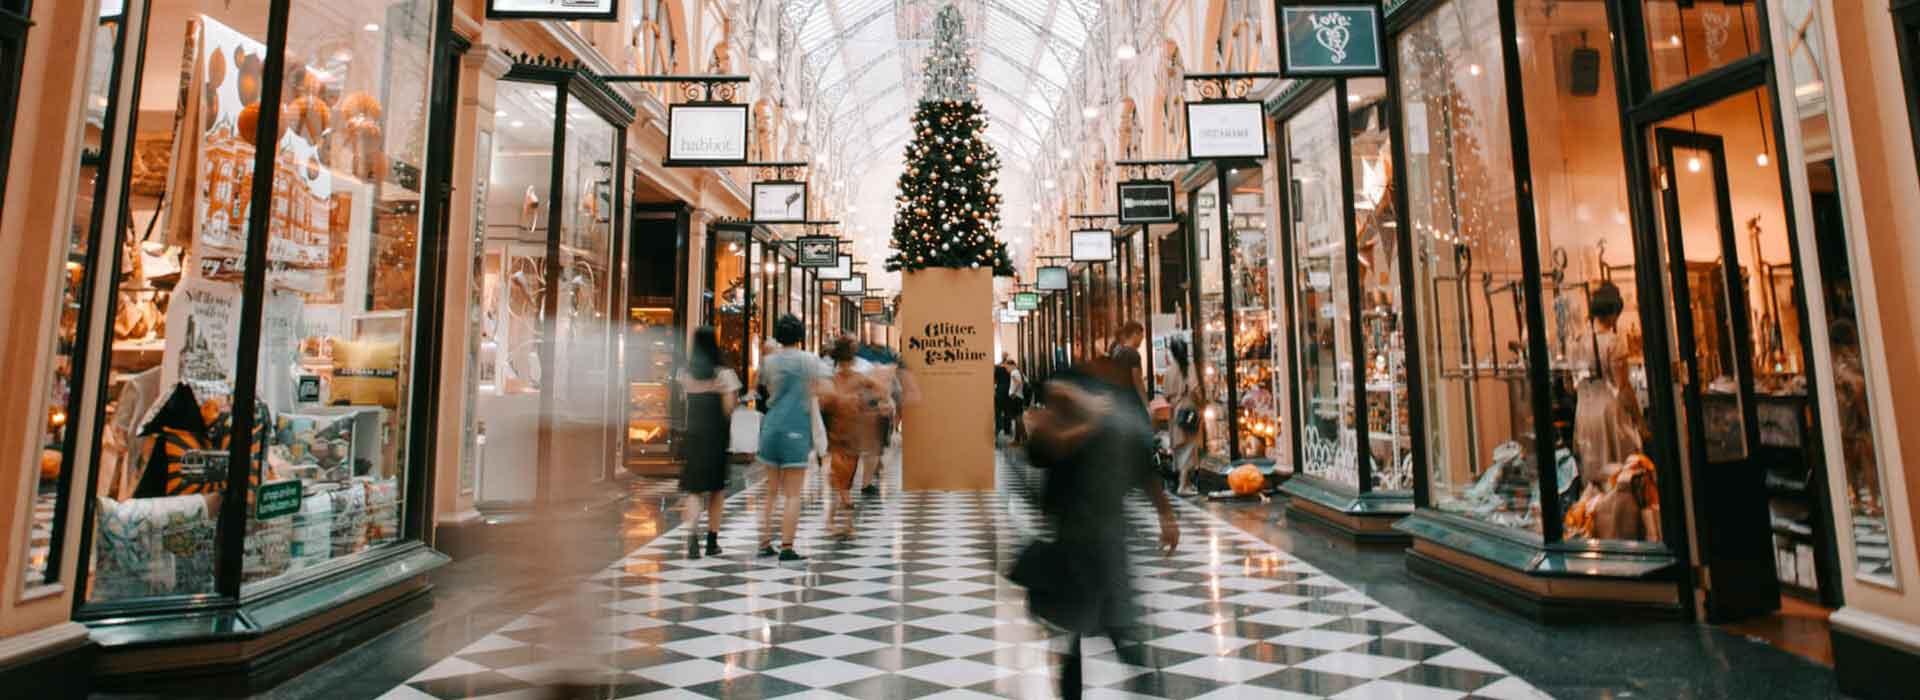 mystery shopping on high street